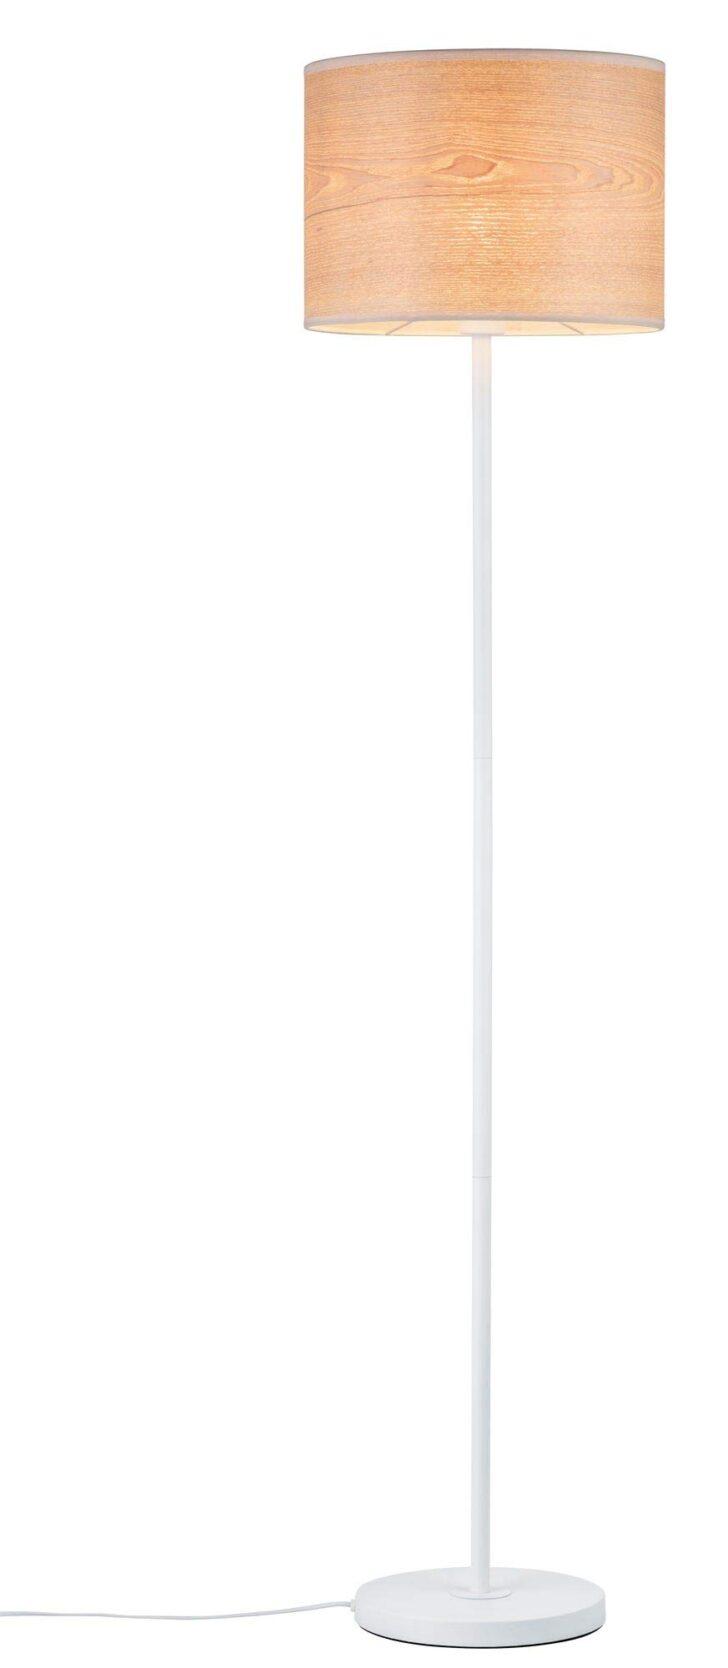 Medium Size of Ikea Stehlampe Holz Regal Naturholz Massivholz Esstisch Küche Modern Holzhaus Garten Betten Bei Wohnzimmer Schlafzimmer Komplett Alu Fenster Massivholzküche Wohnzimmer Ikea Stehlampe Holz